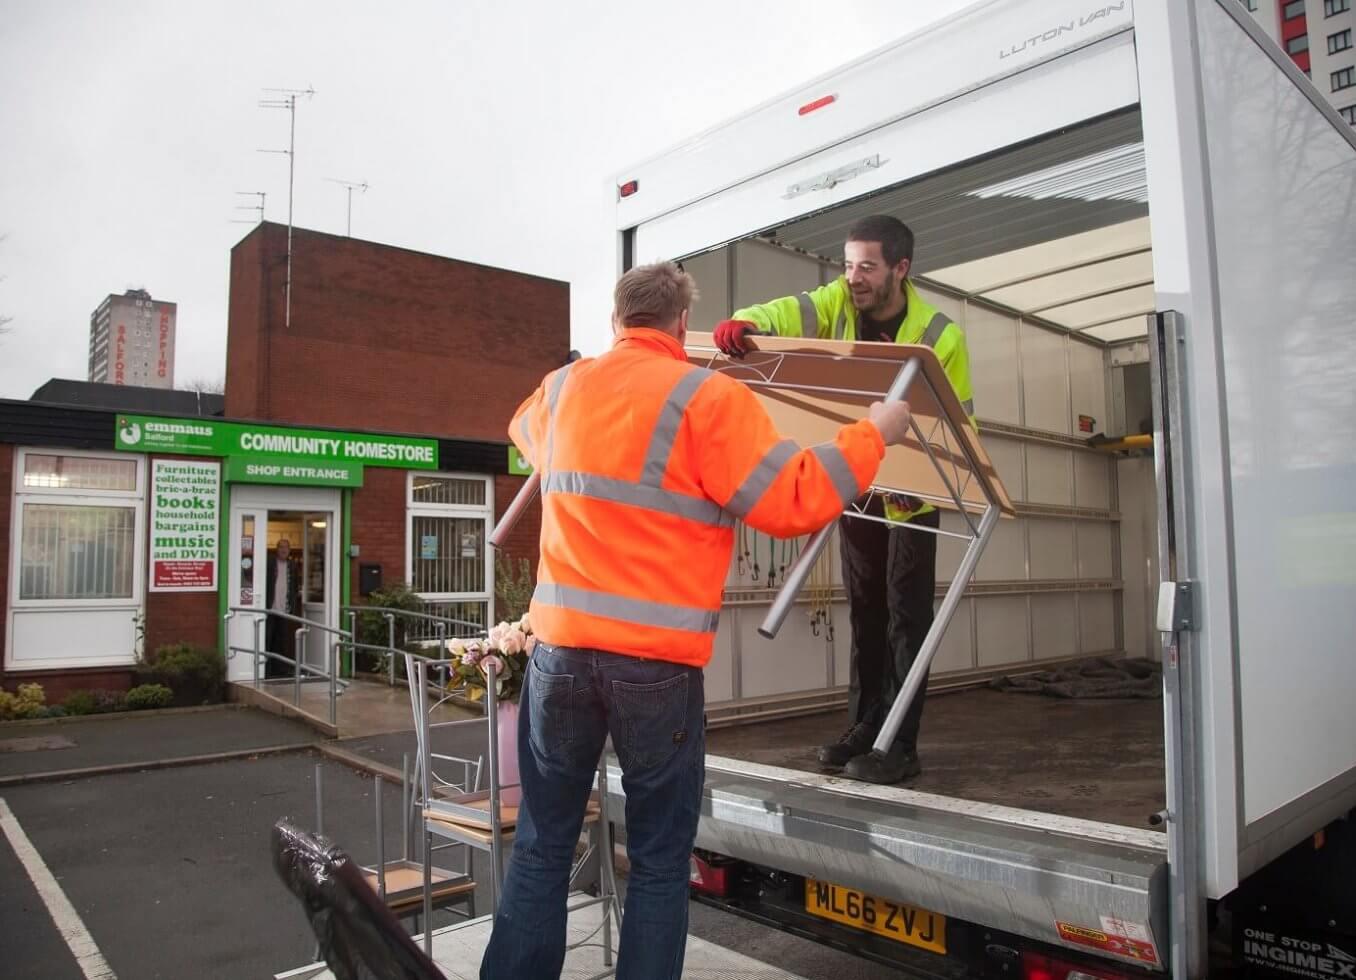 Donating goods to Emmaus Bristol